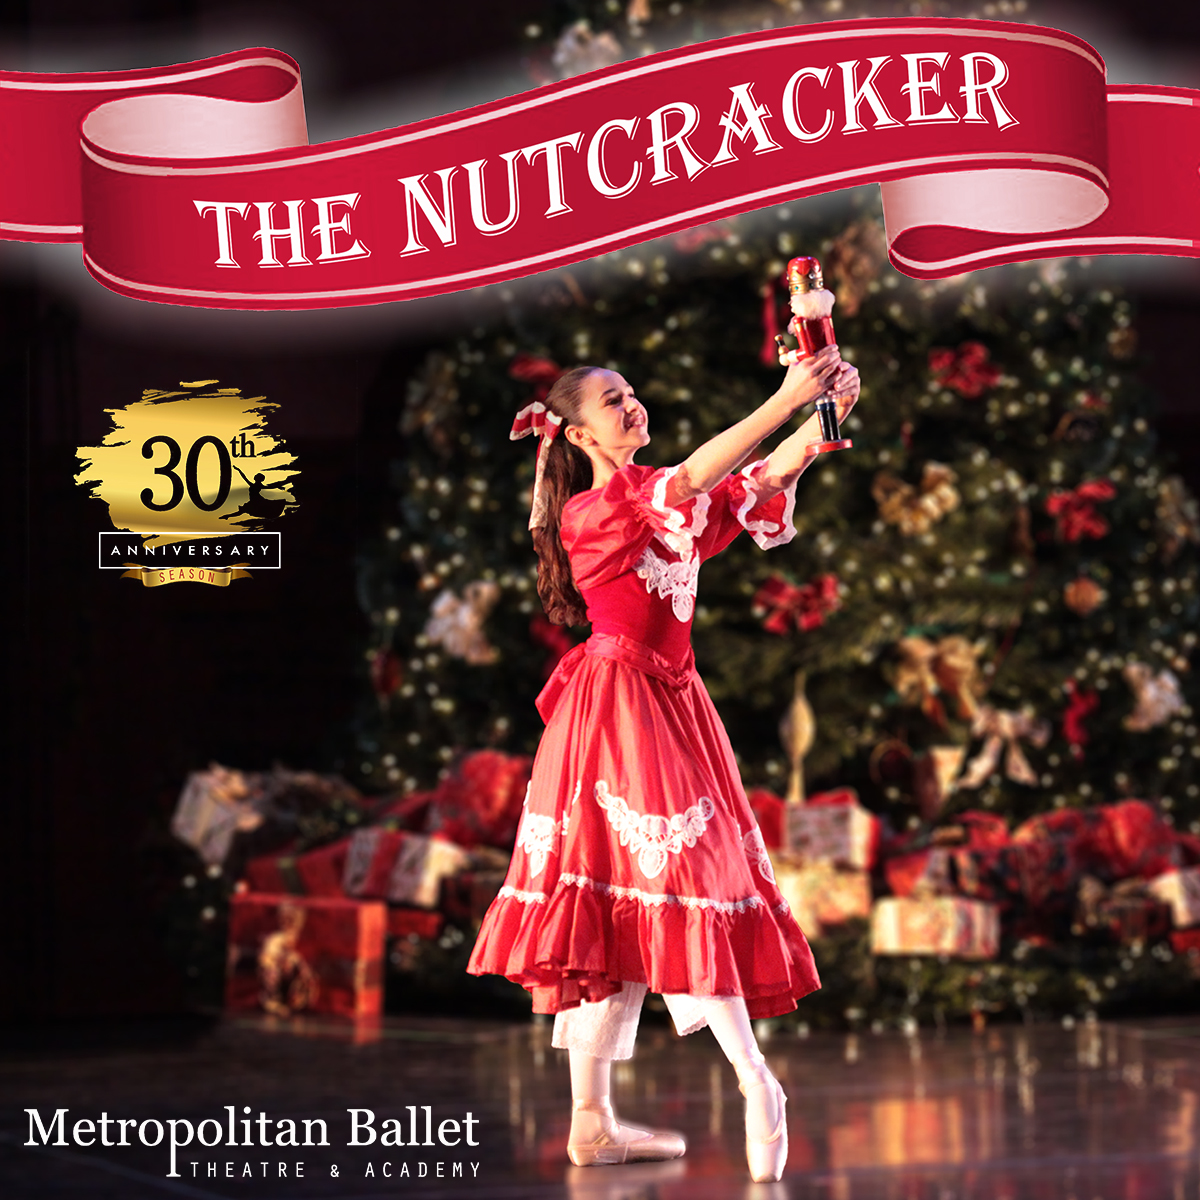 30f28c040215 MBT s 30th Anniversary Season of The Nutcracker